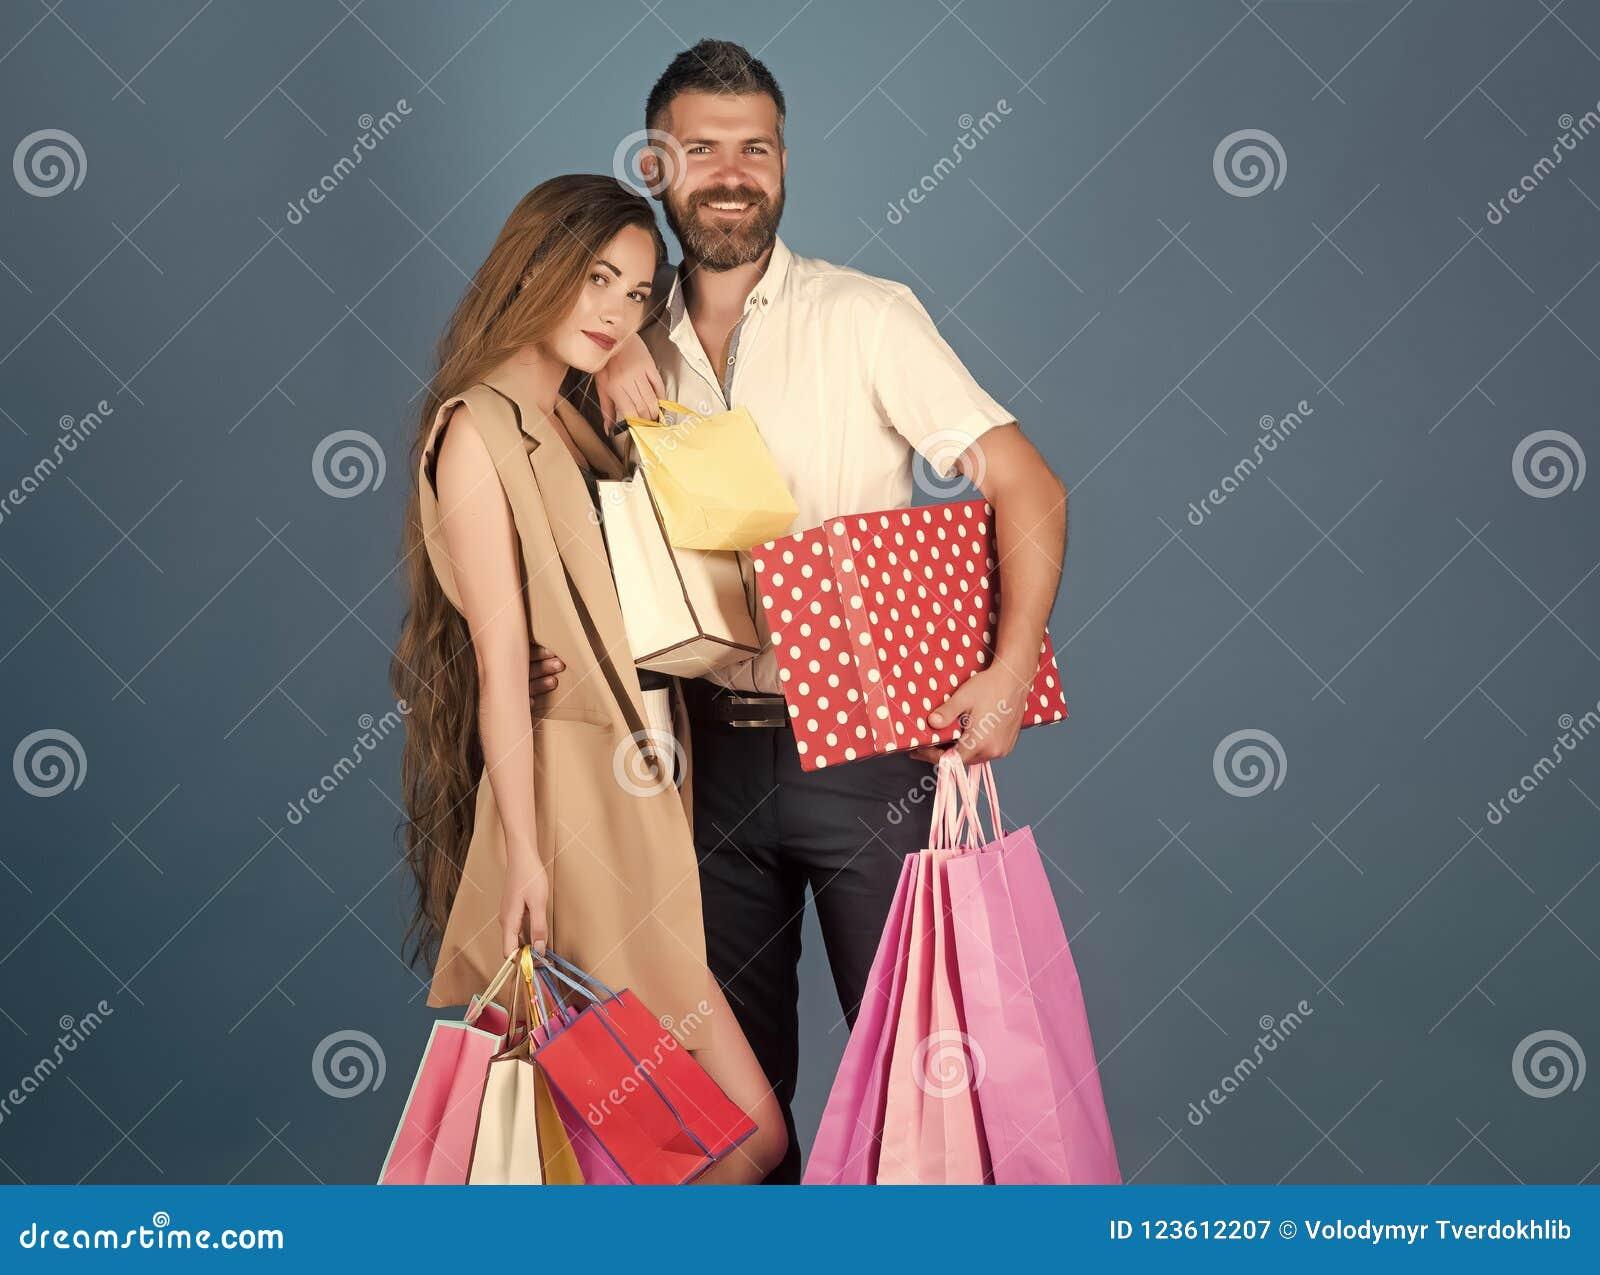 Saranghaeyo arumi online dating